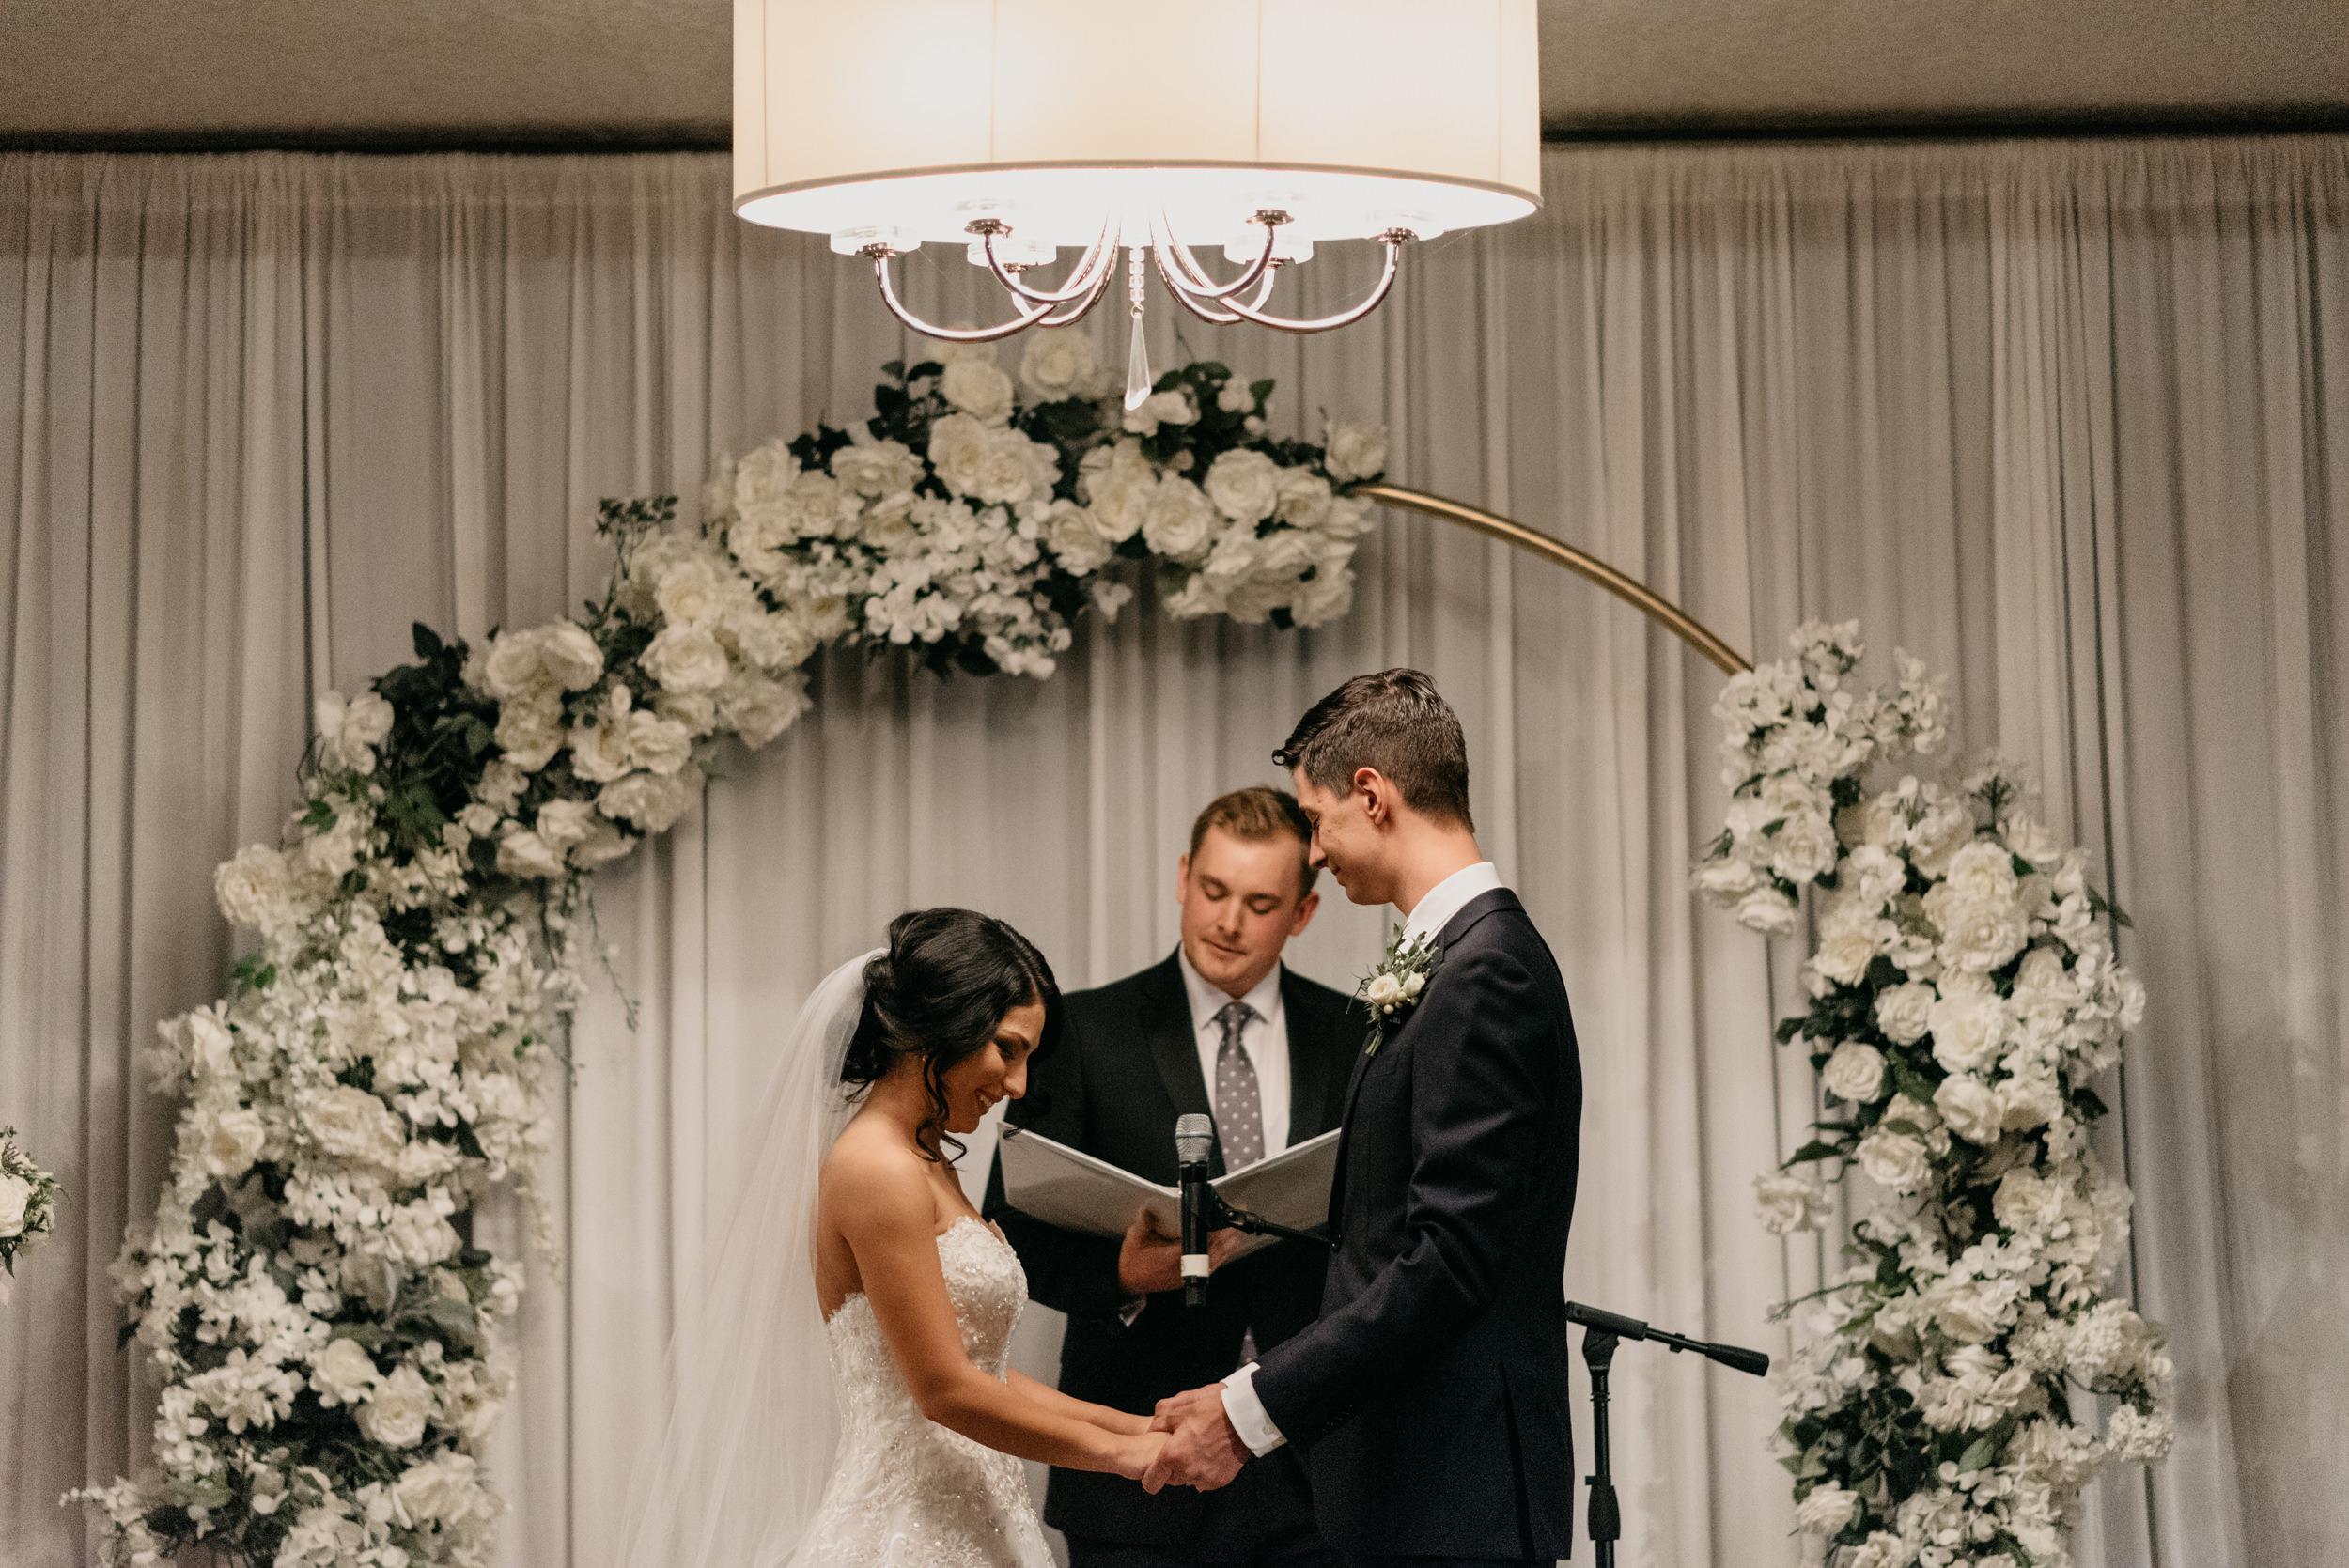 80-ceremony-west-end-ballroom-portland-wedding-venue-9169.jpg